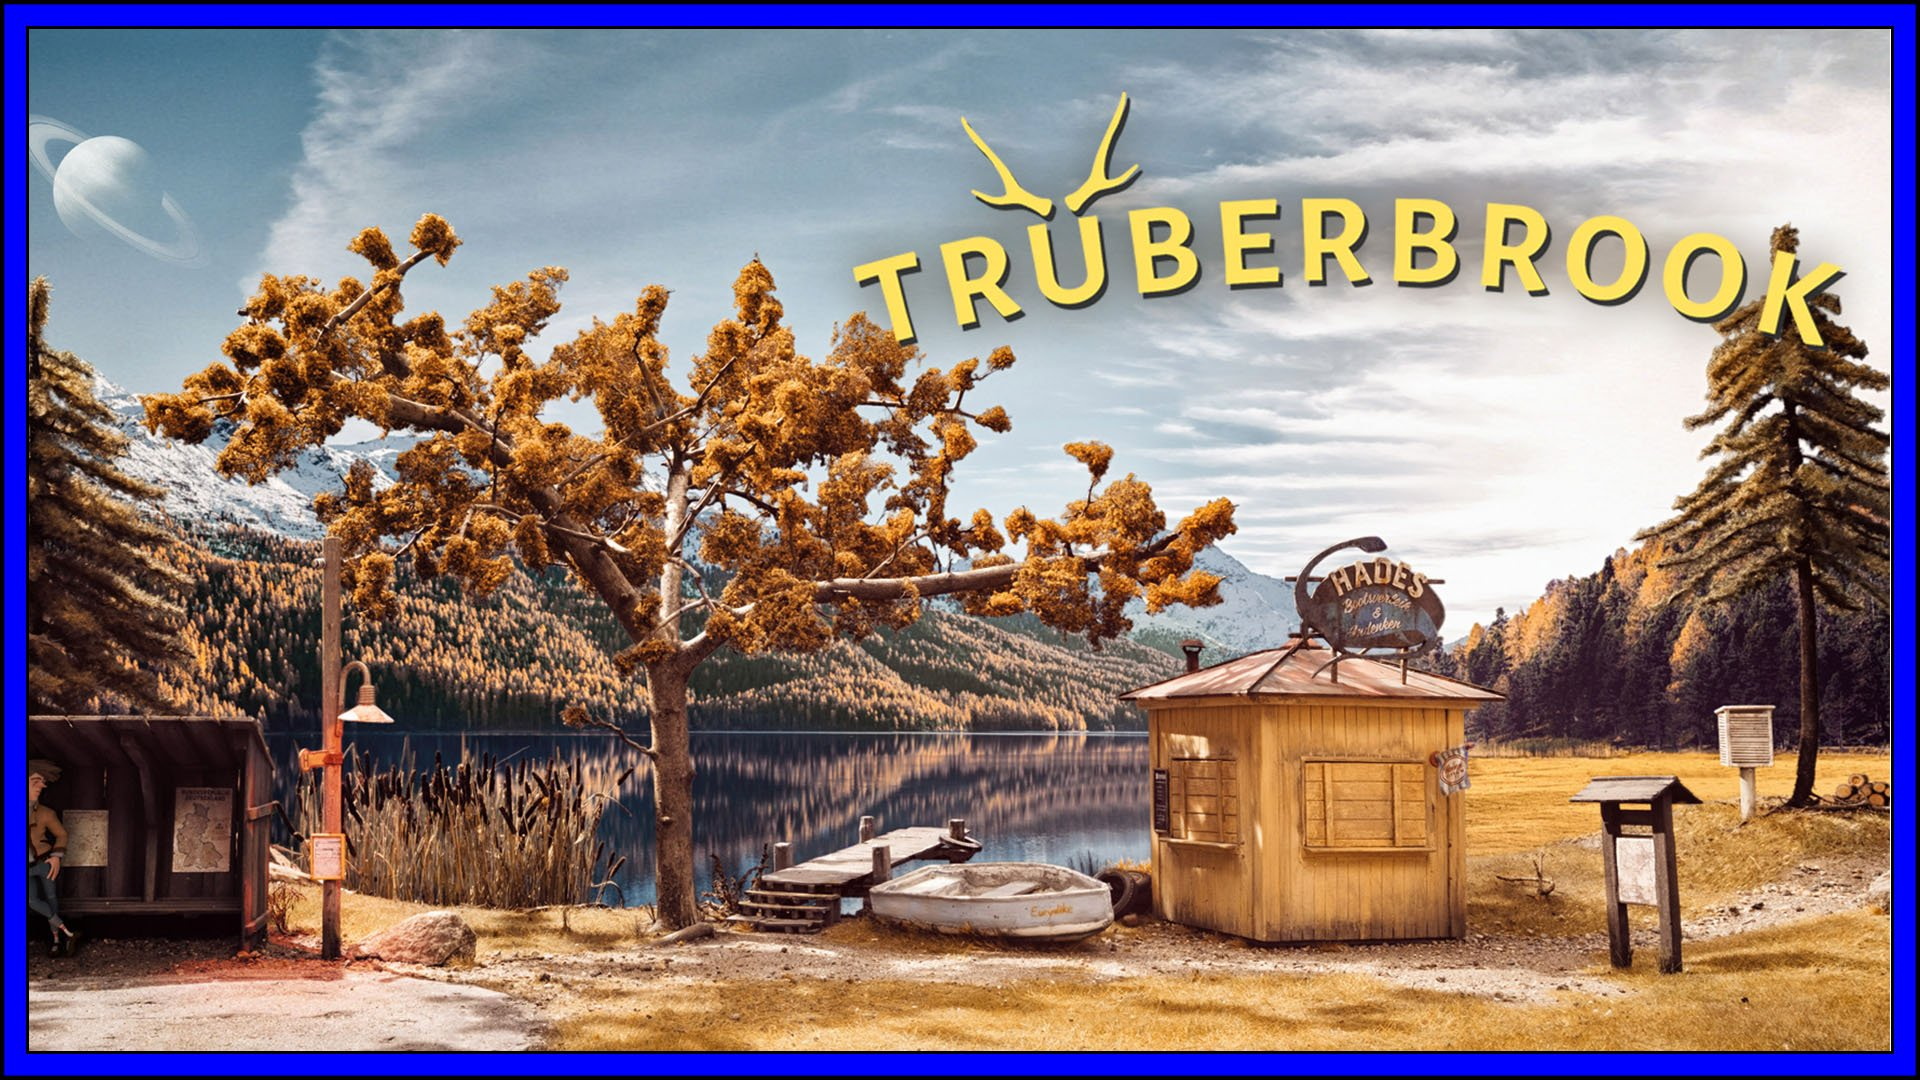 Truberbrook Fi3